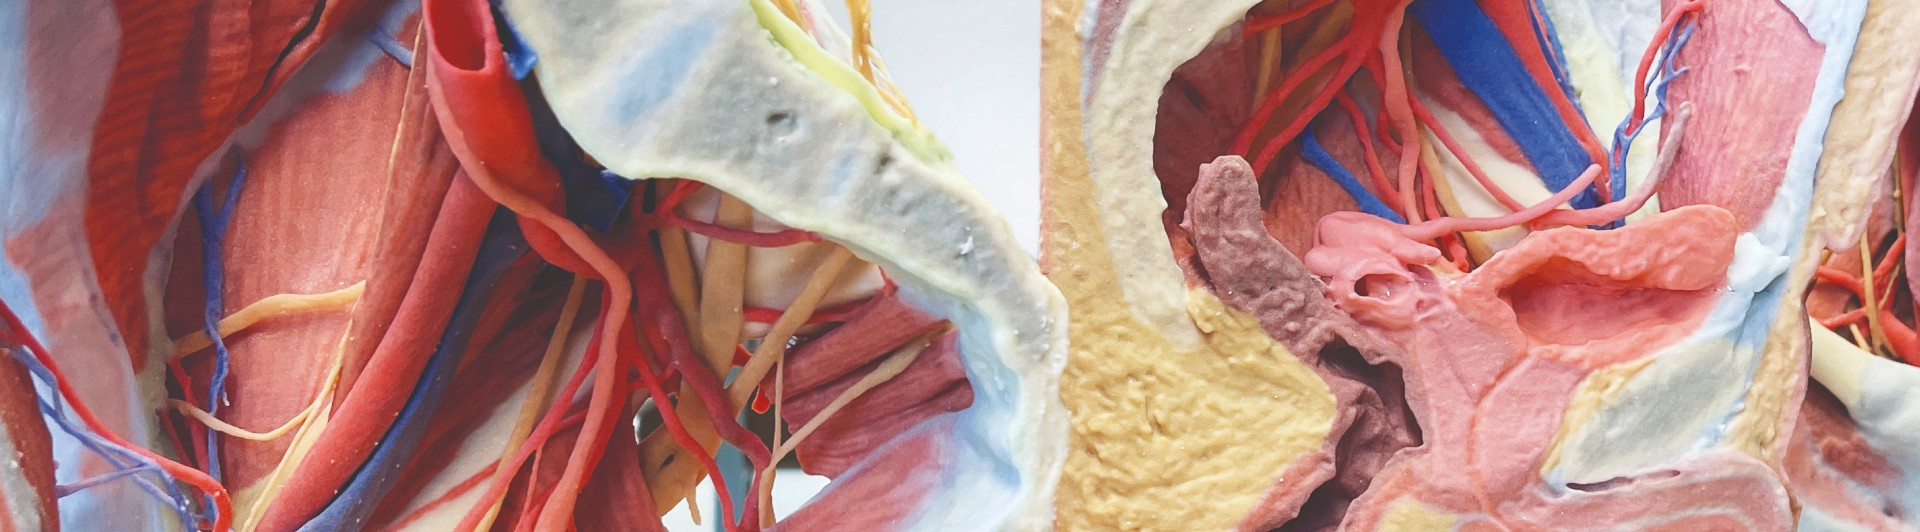 3D Anatomie Serie